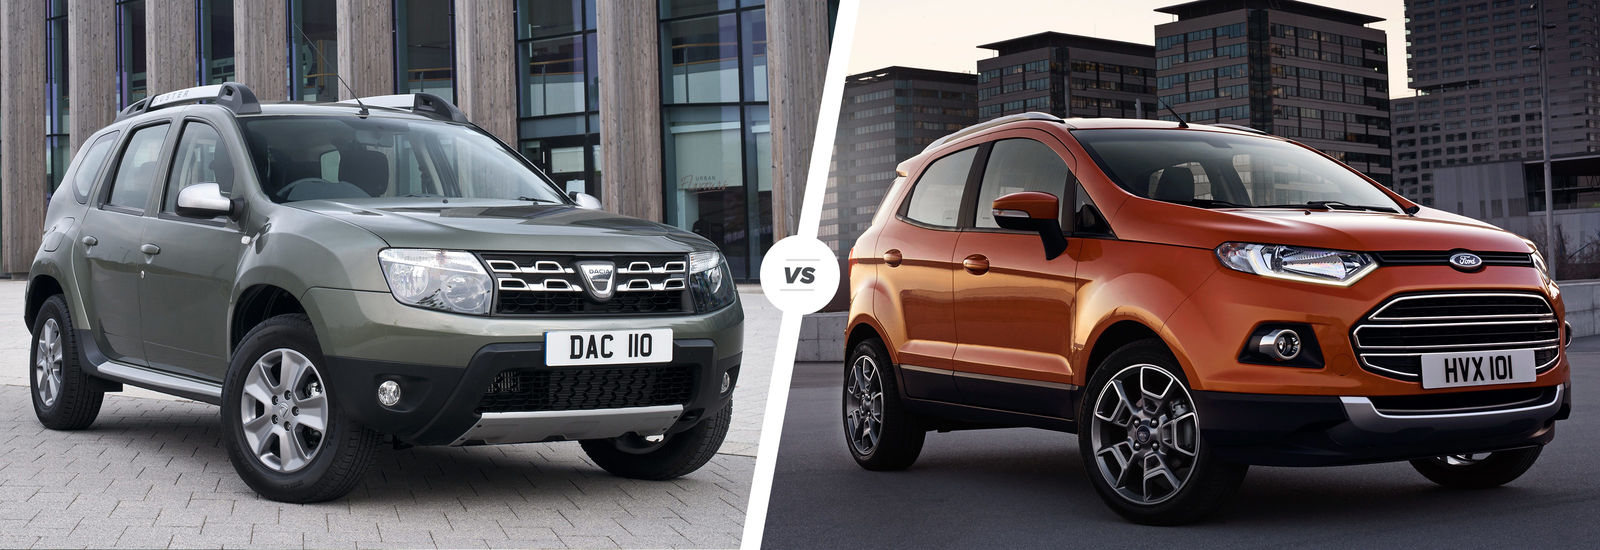 dacia duster vs ford ecosport suv comparison carwow. Black Bedroom Furniture Sets. Home Design Ideas